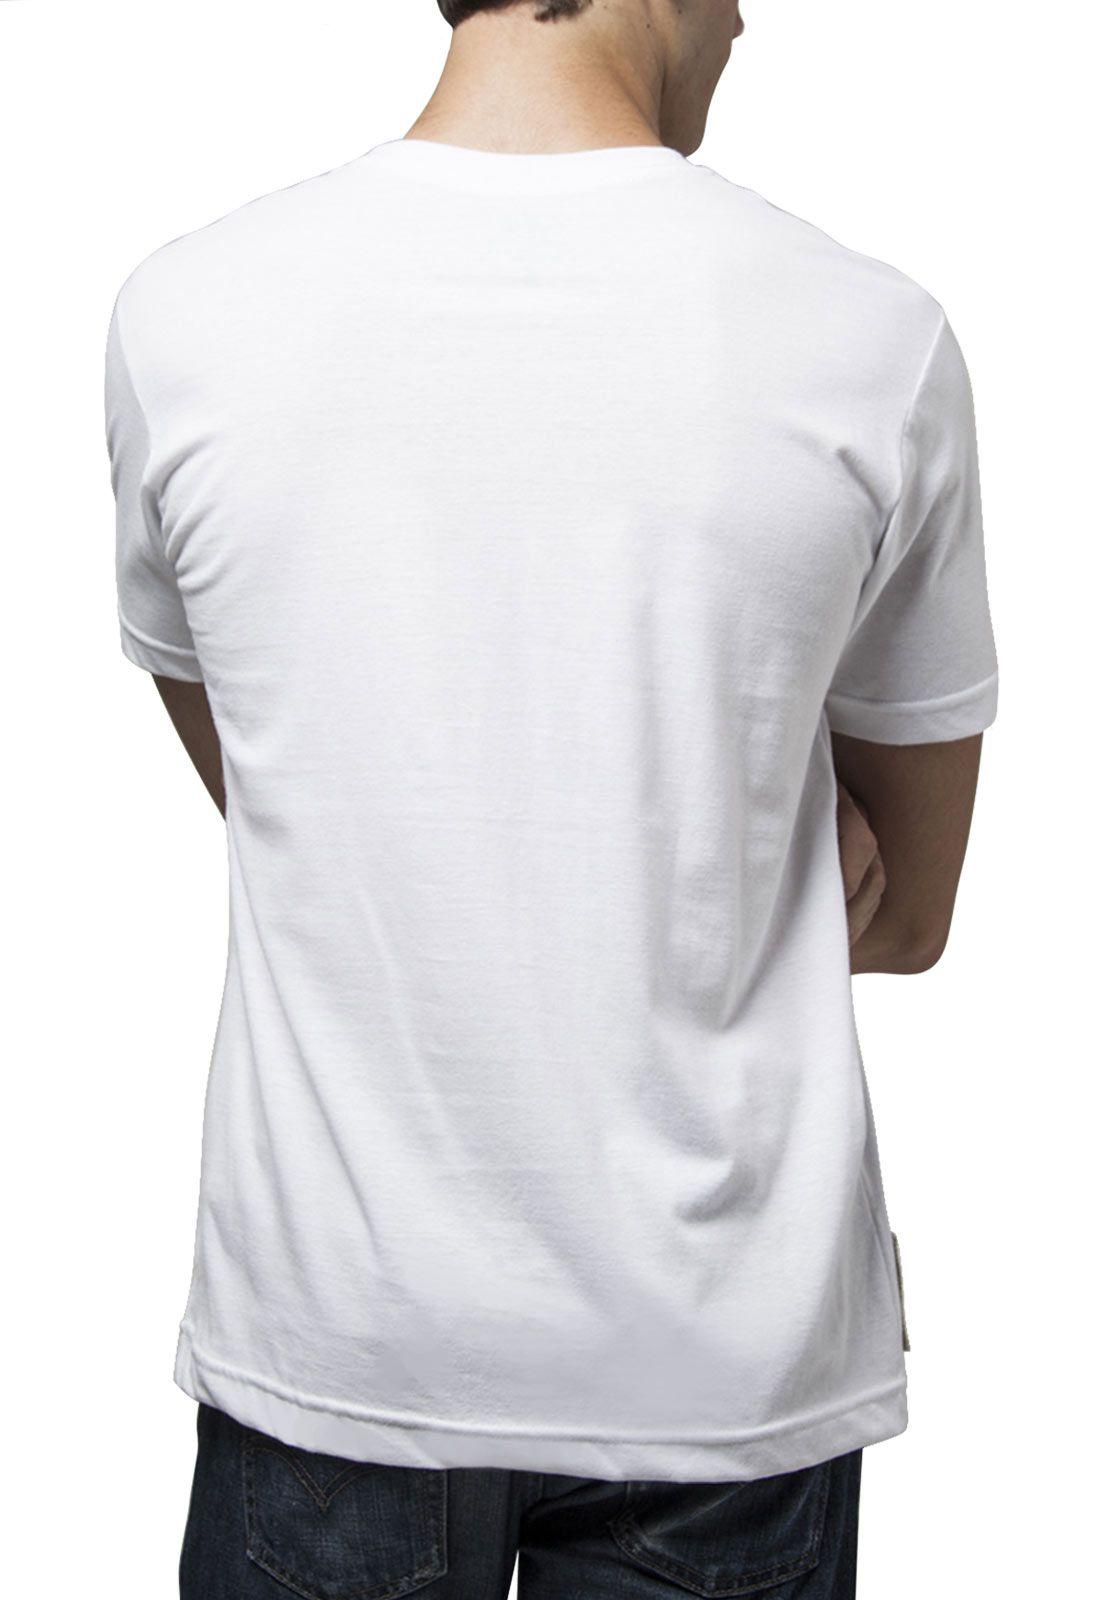 Camiseta Amazônia Fusca  - Branco